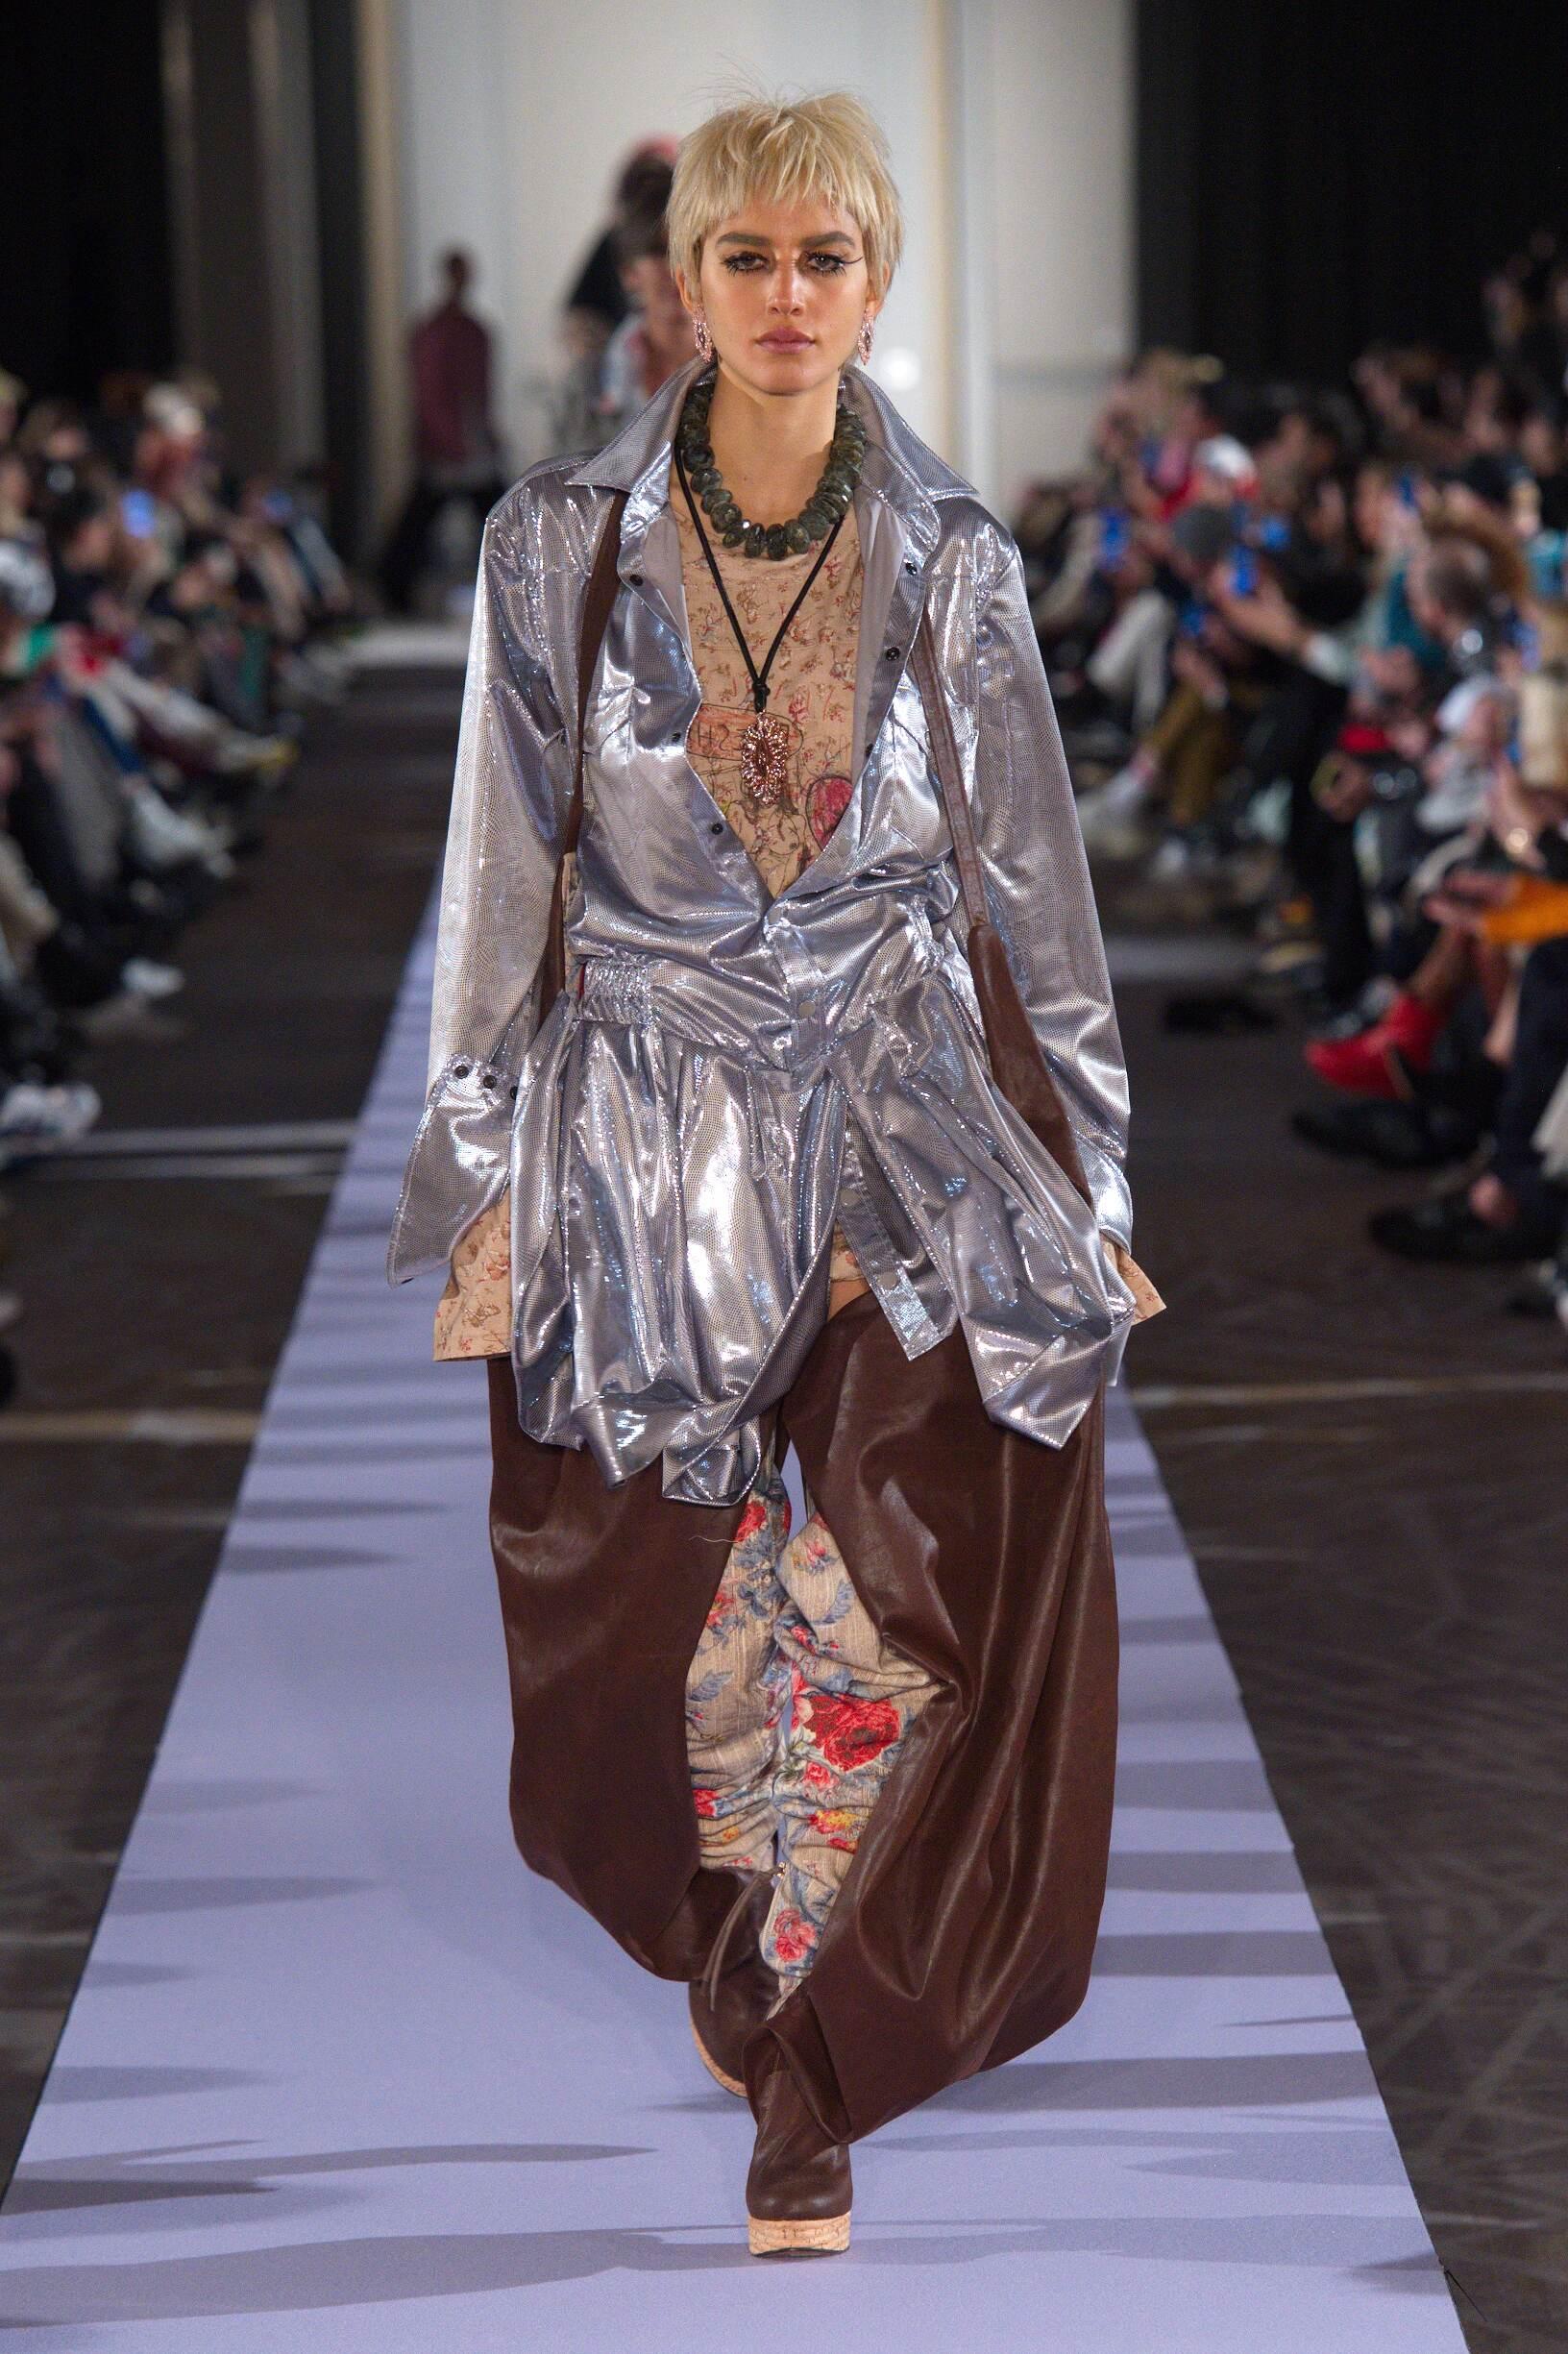 Fashion Show Woman Model Andreas Kronthaler for Vivienne Westwood Catwalk